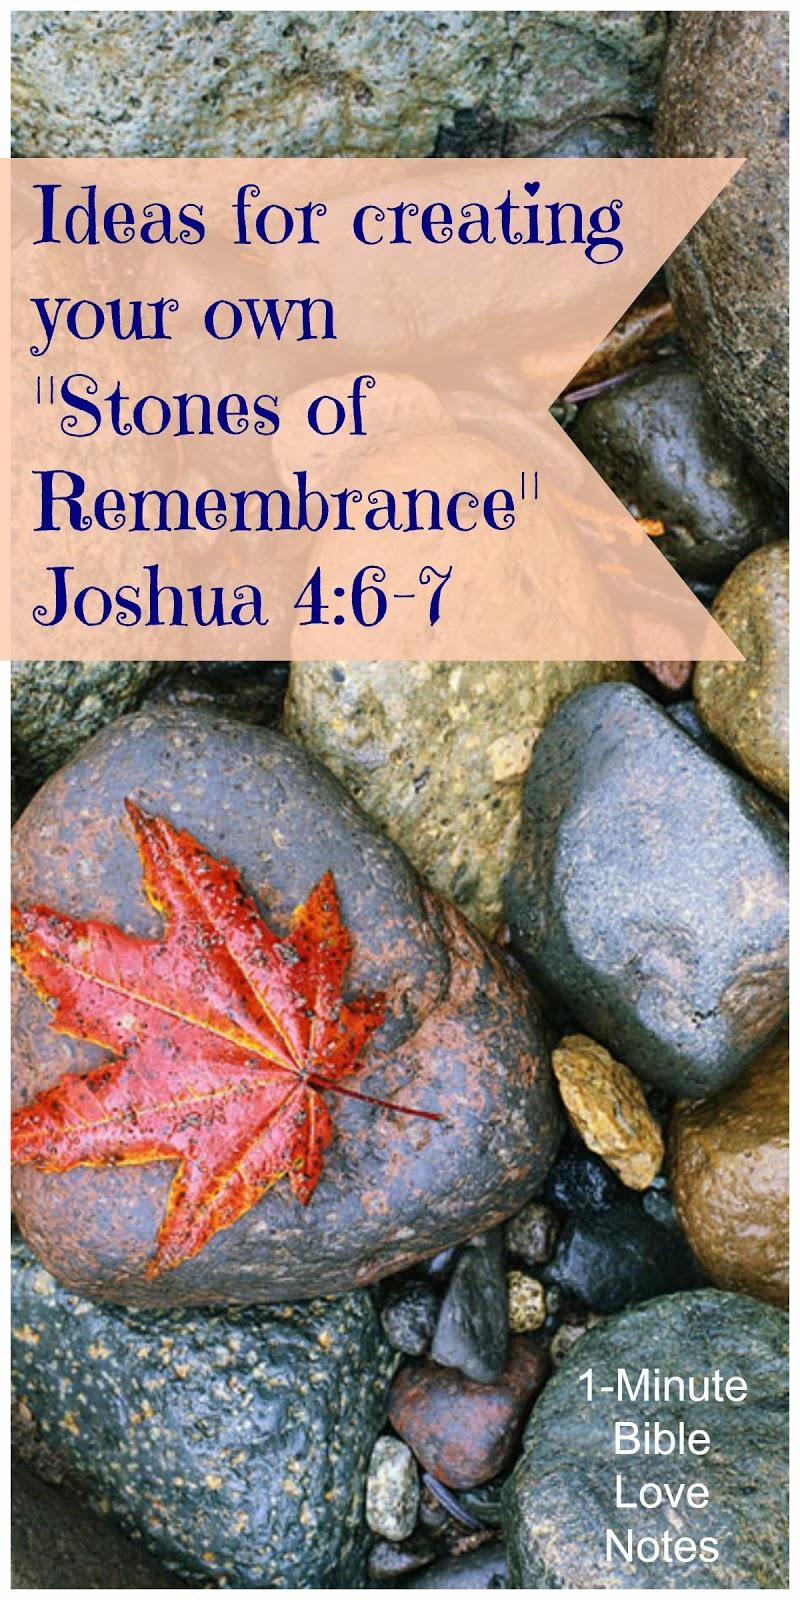 Joshua 4:6-7, stones of remembrance